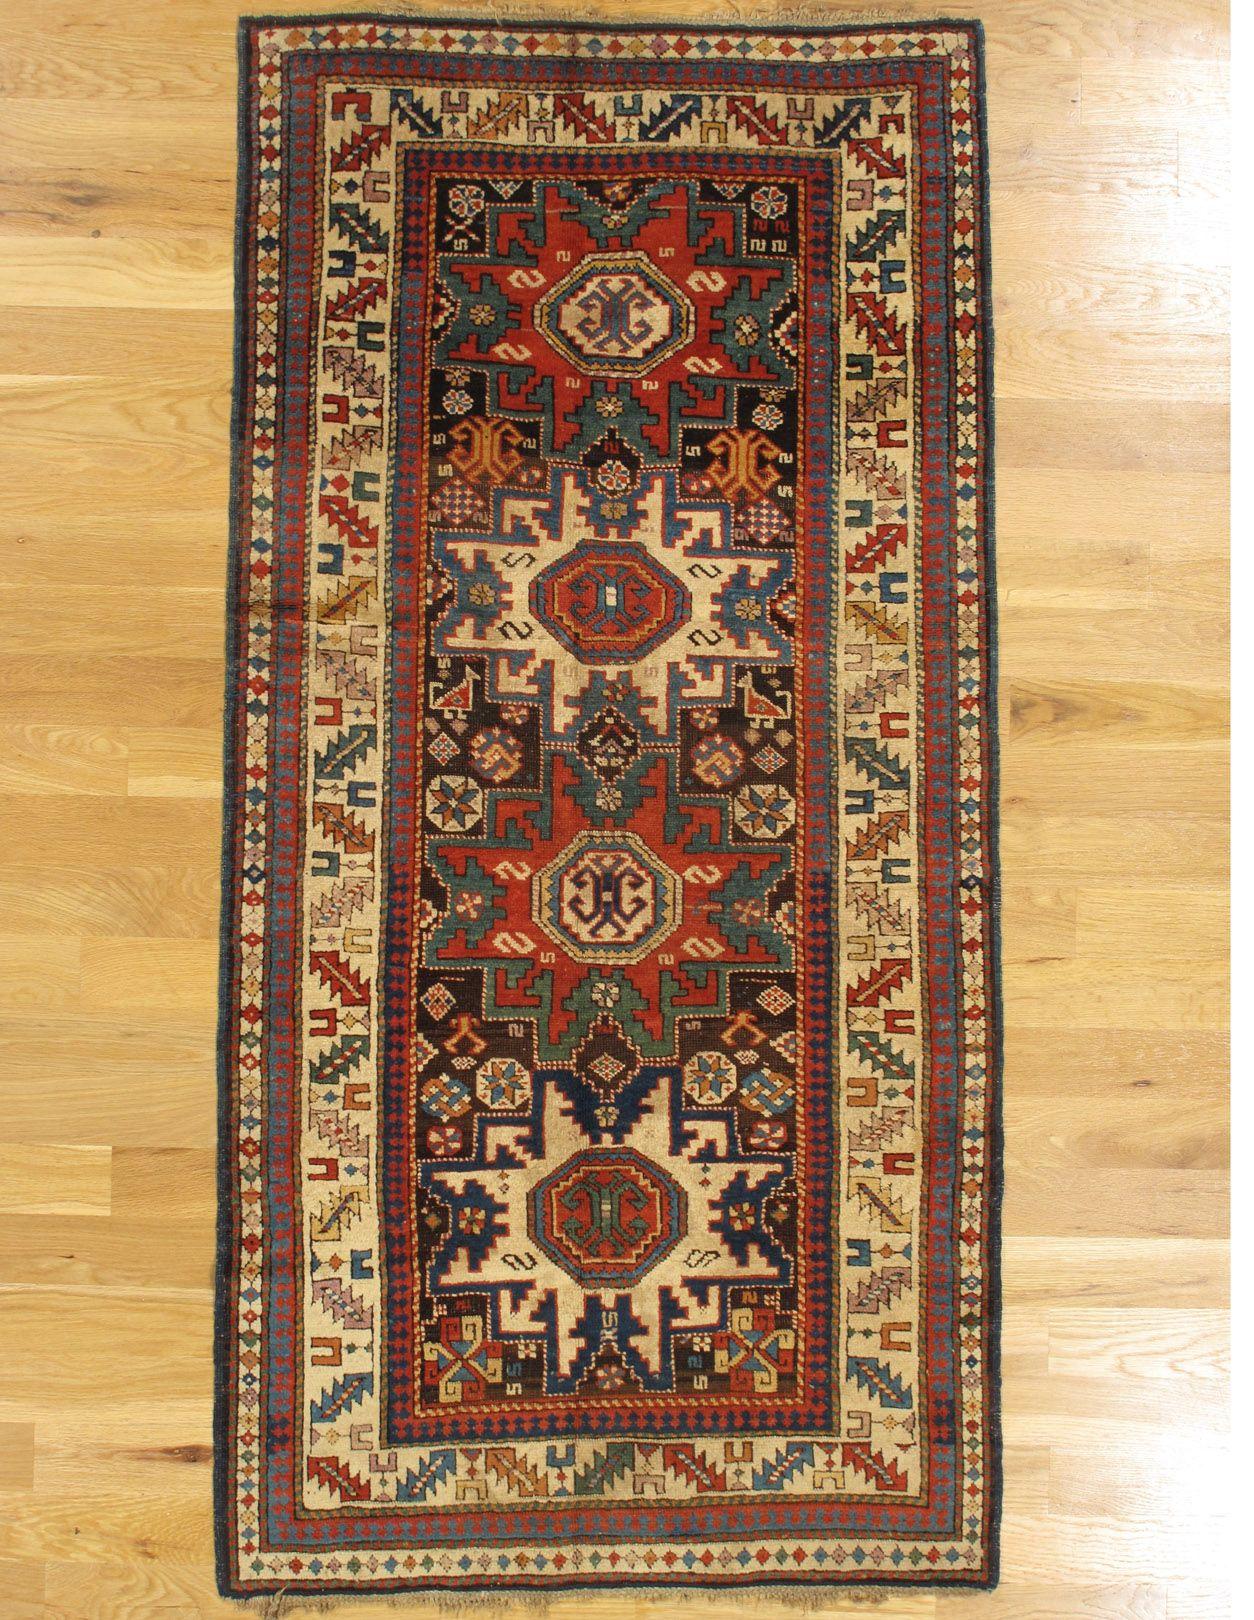 "Lesghi rug,Kuba District,Eastern Caucasus,circa 1870, 6'.0""x3'.0"" (183x91 cm)."